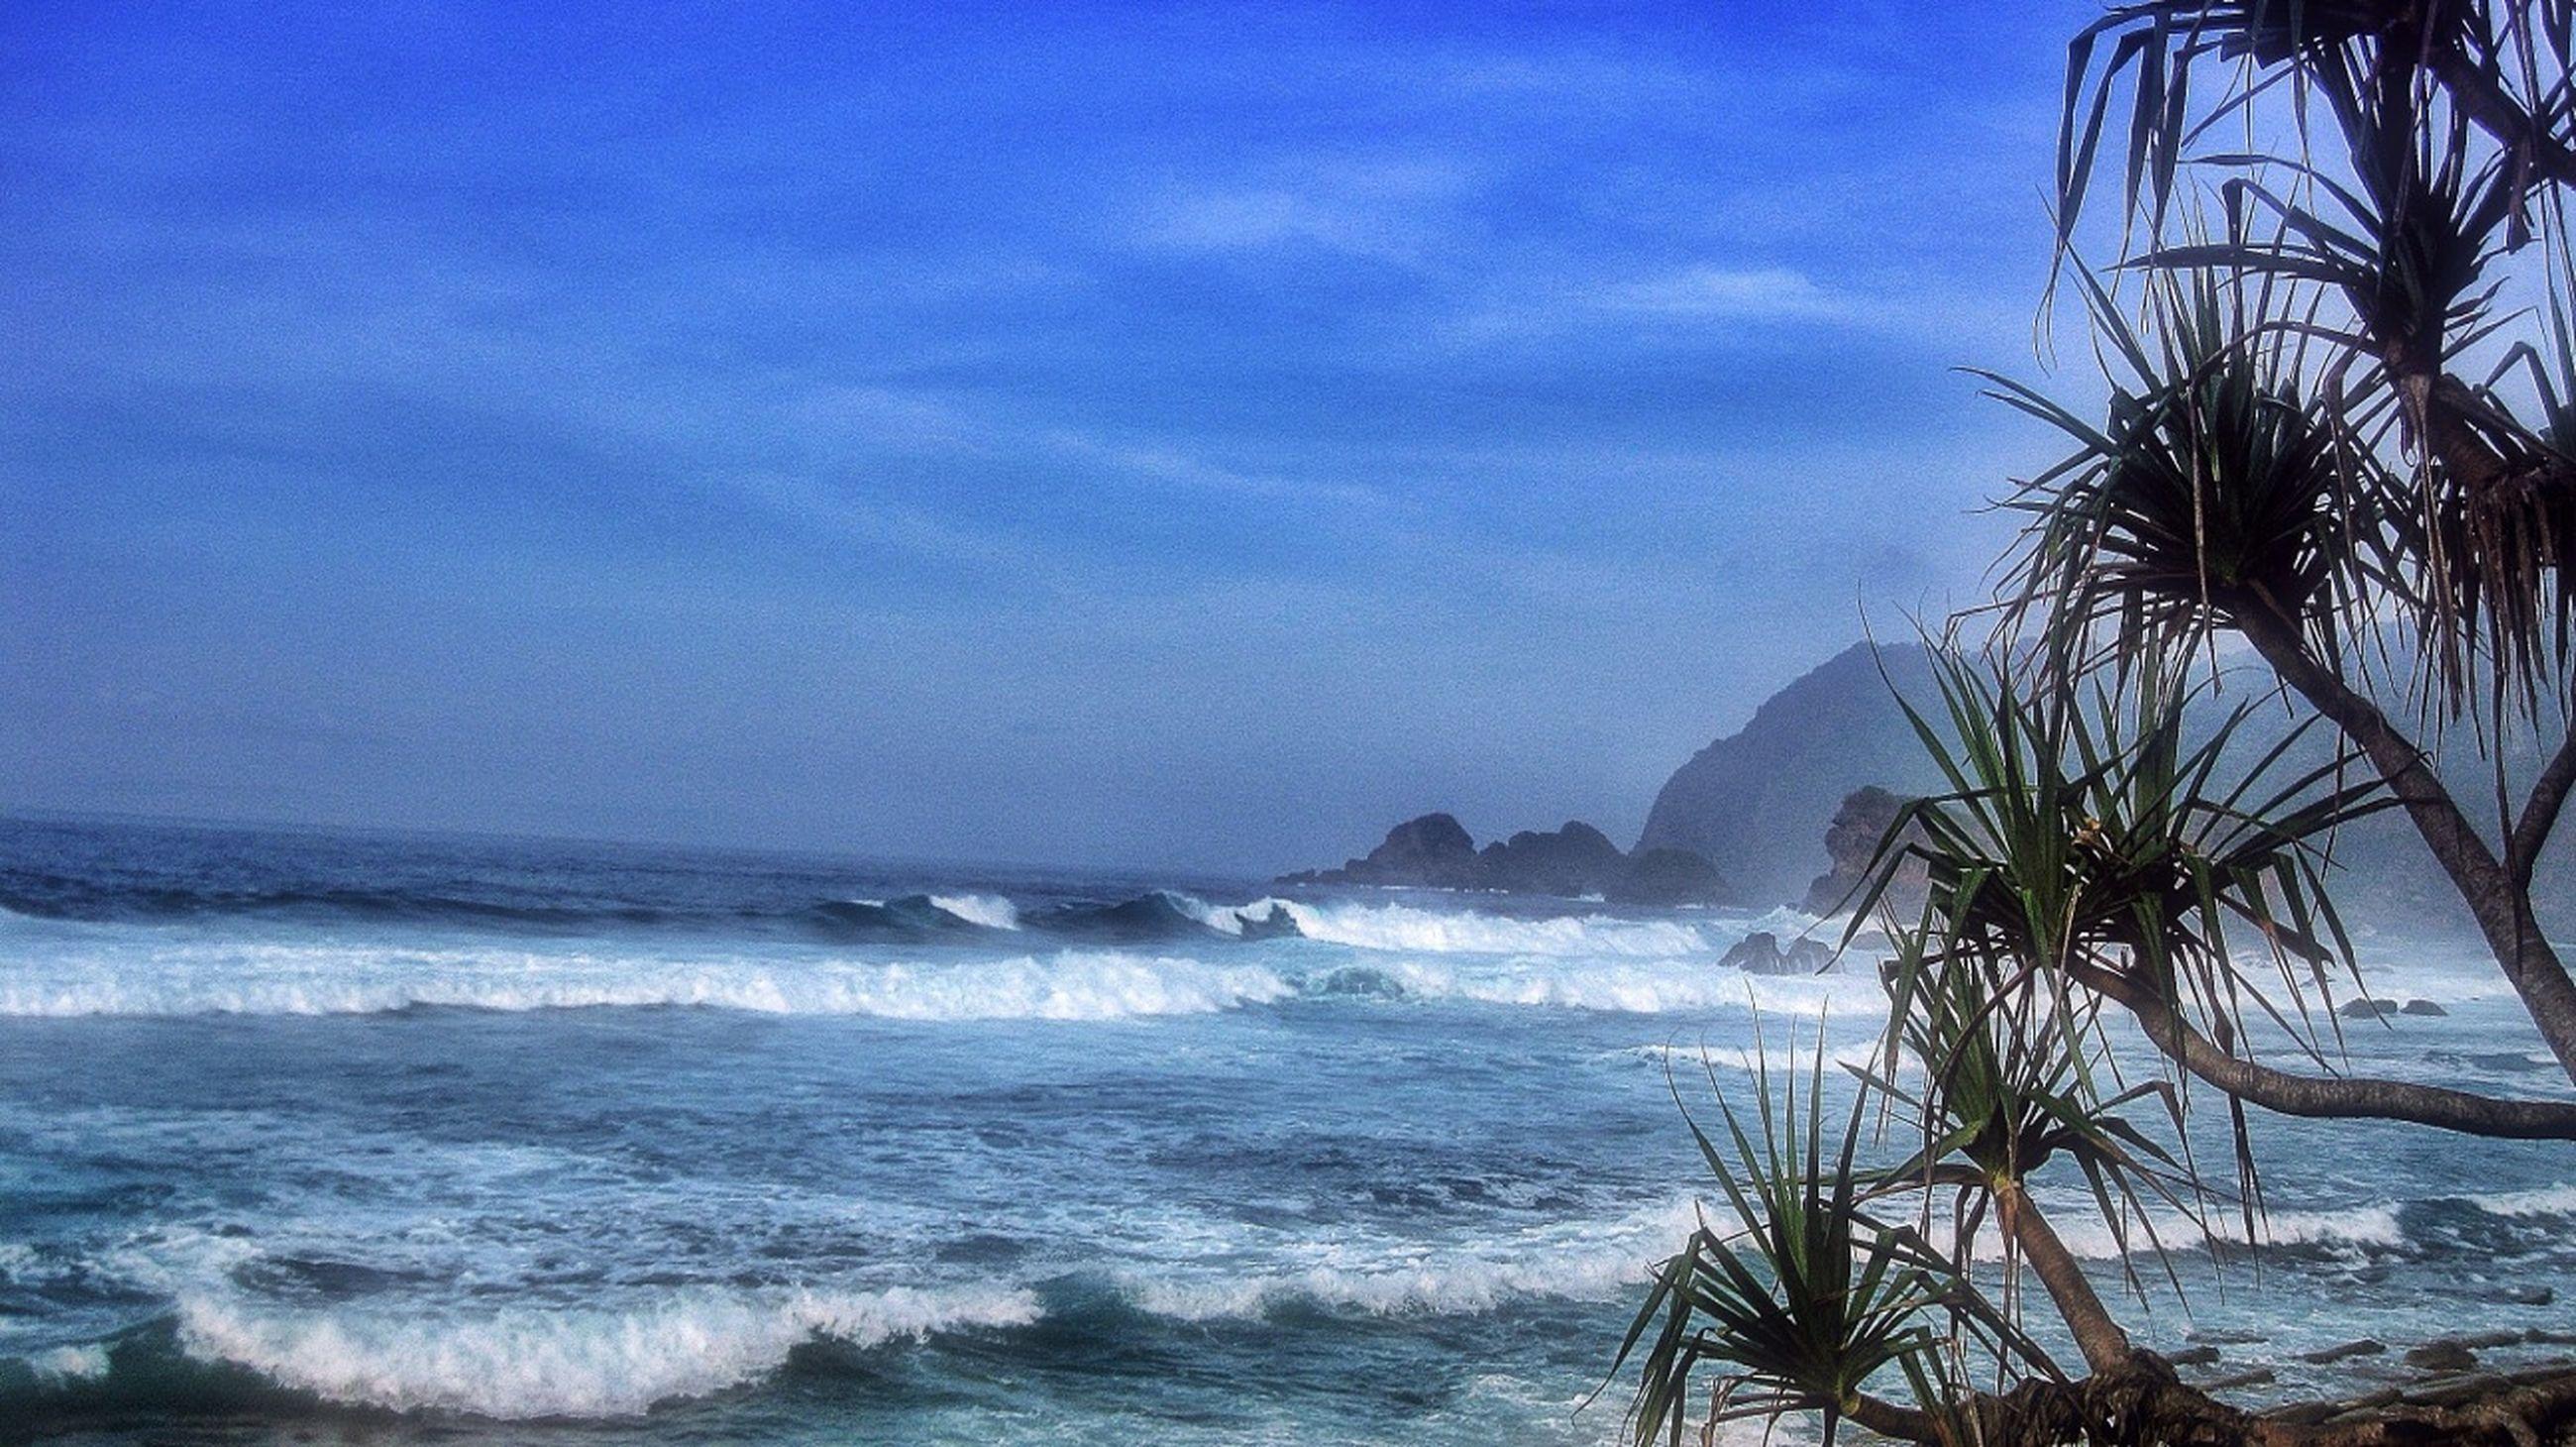 sea, water, horizon over water, beach, sky, scenics, tranquil scene, tranquility, beauty in nature, shore, palm tree, nature, tree, wave, blue, cloud - sky, coastline, idyllic, cloud, surf